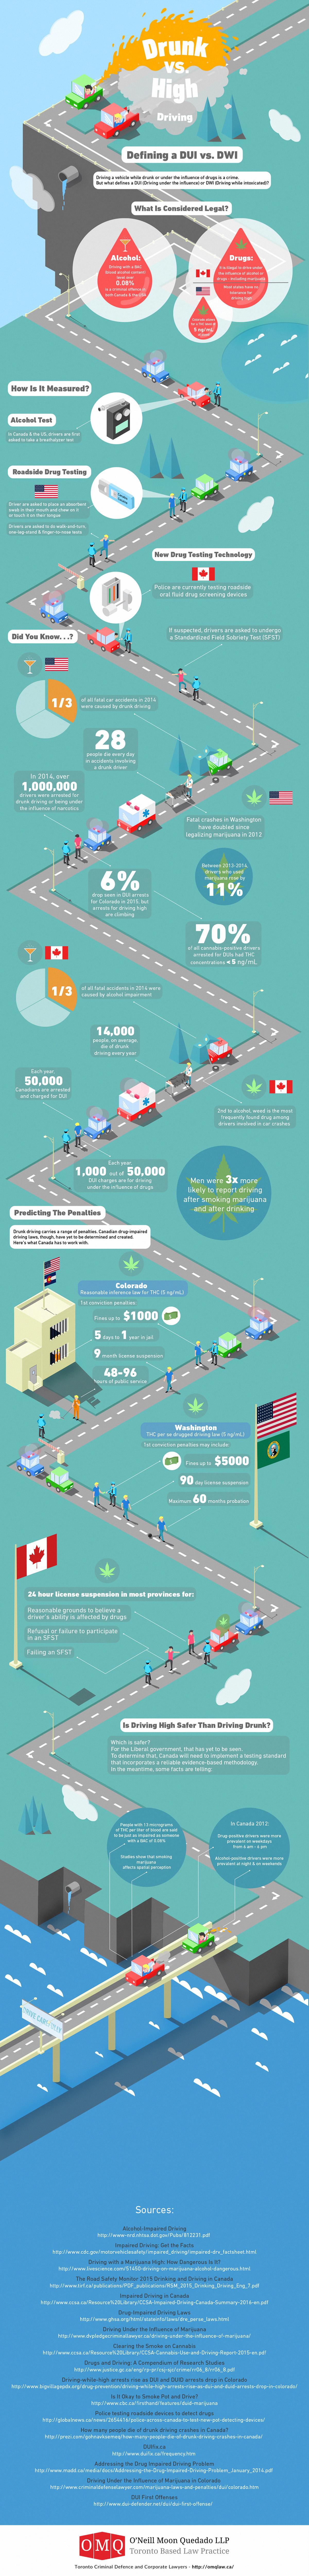 O'Neill Moon Quedado LLP Drunk Driving vs. High Driving Infographic